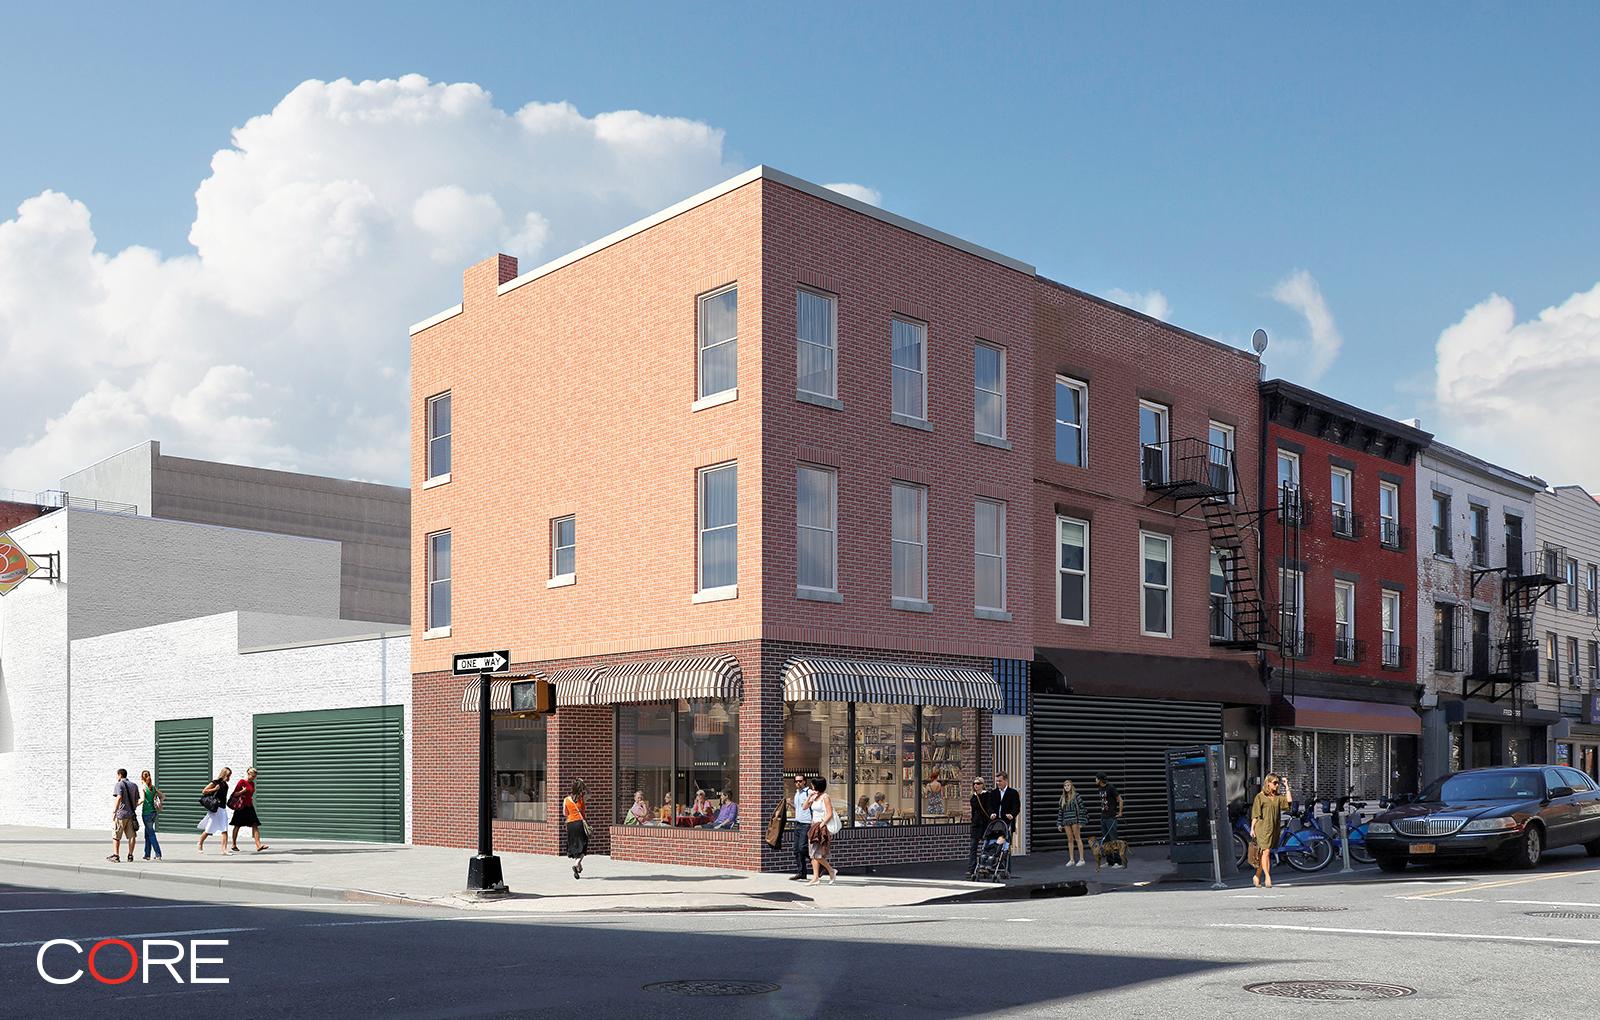 314 grand st brooklyn ny 11211 core real estate